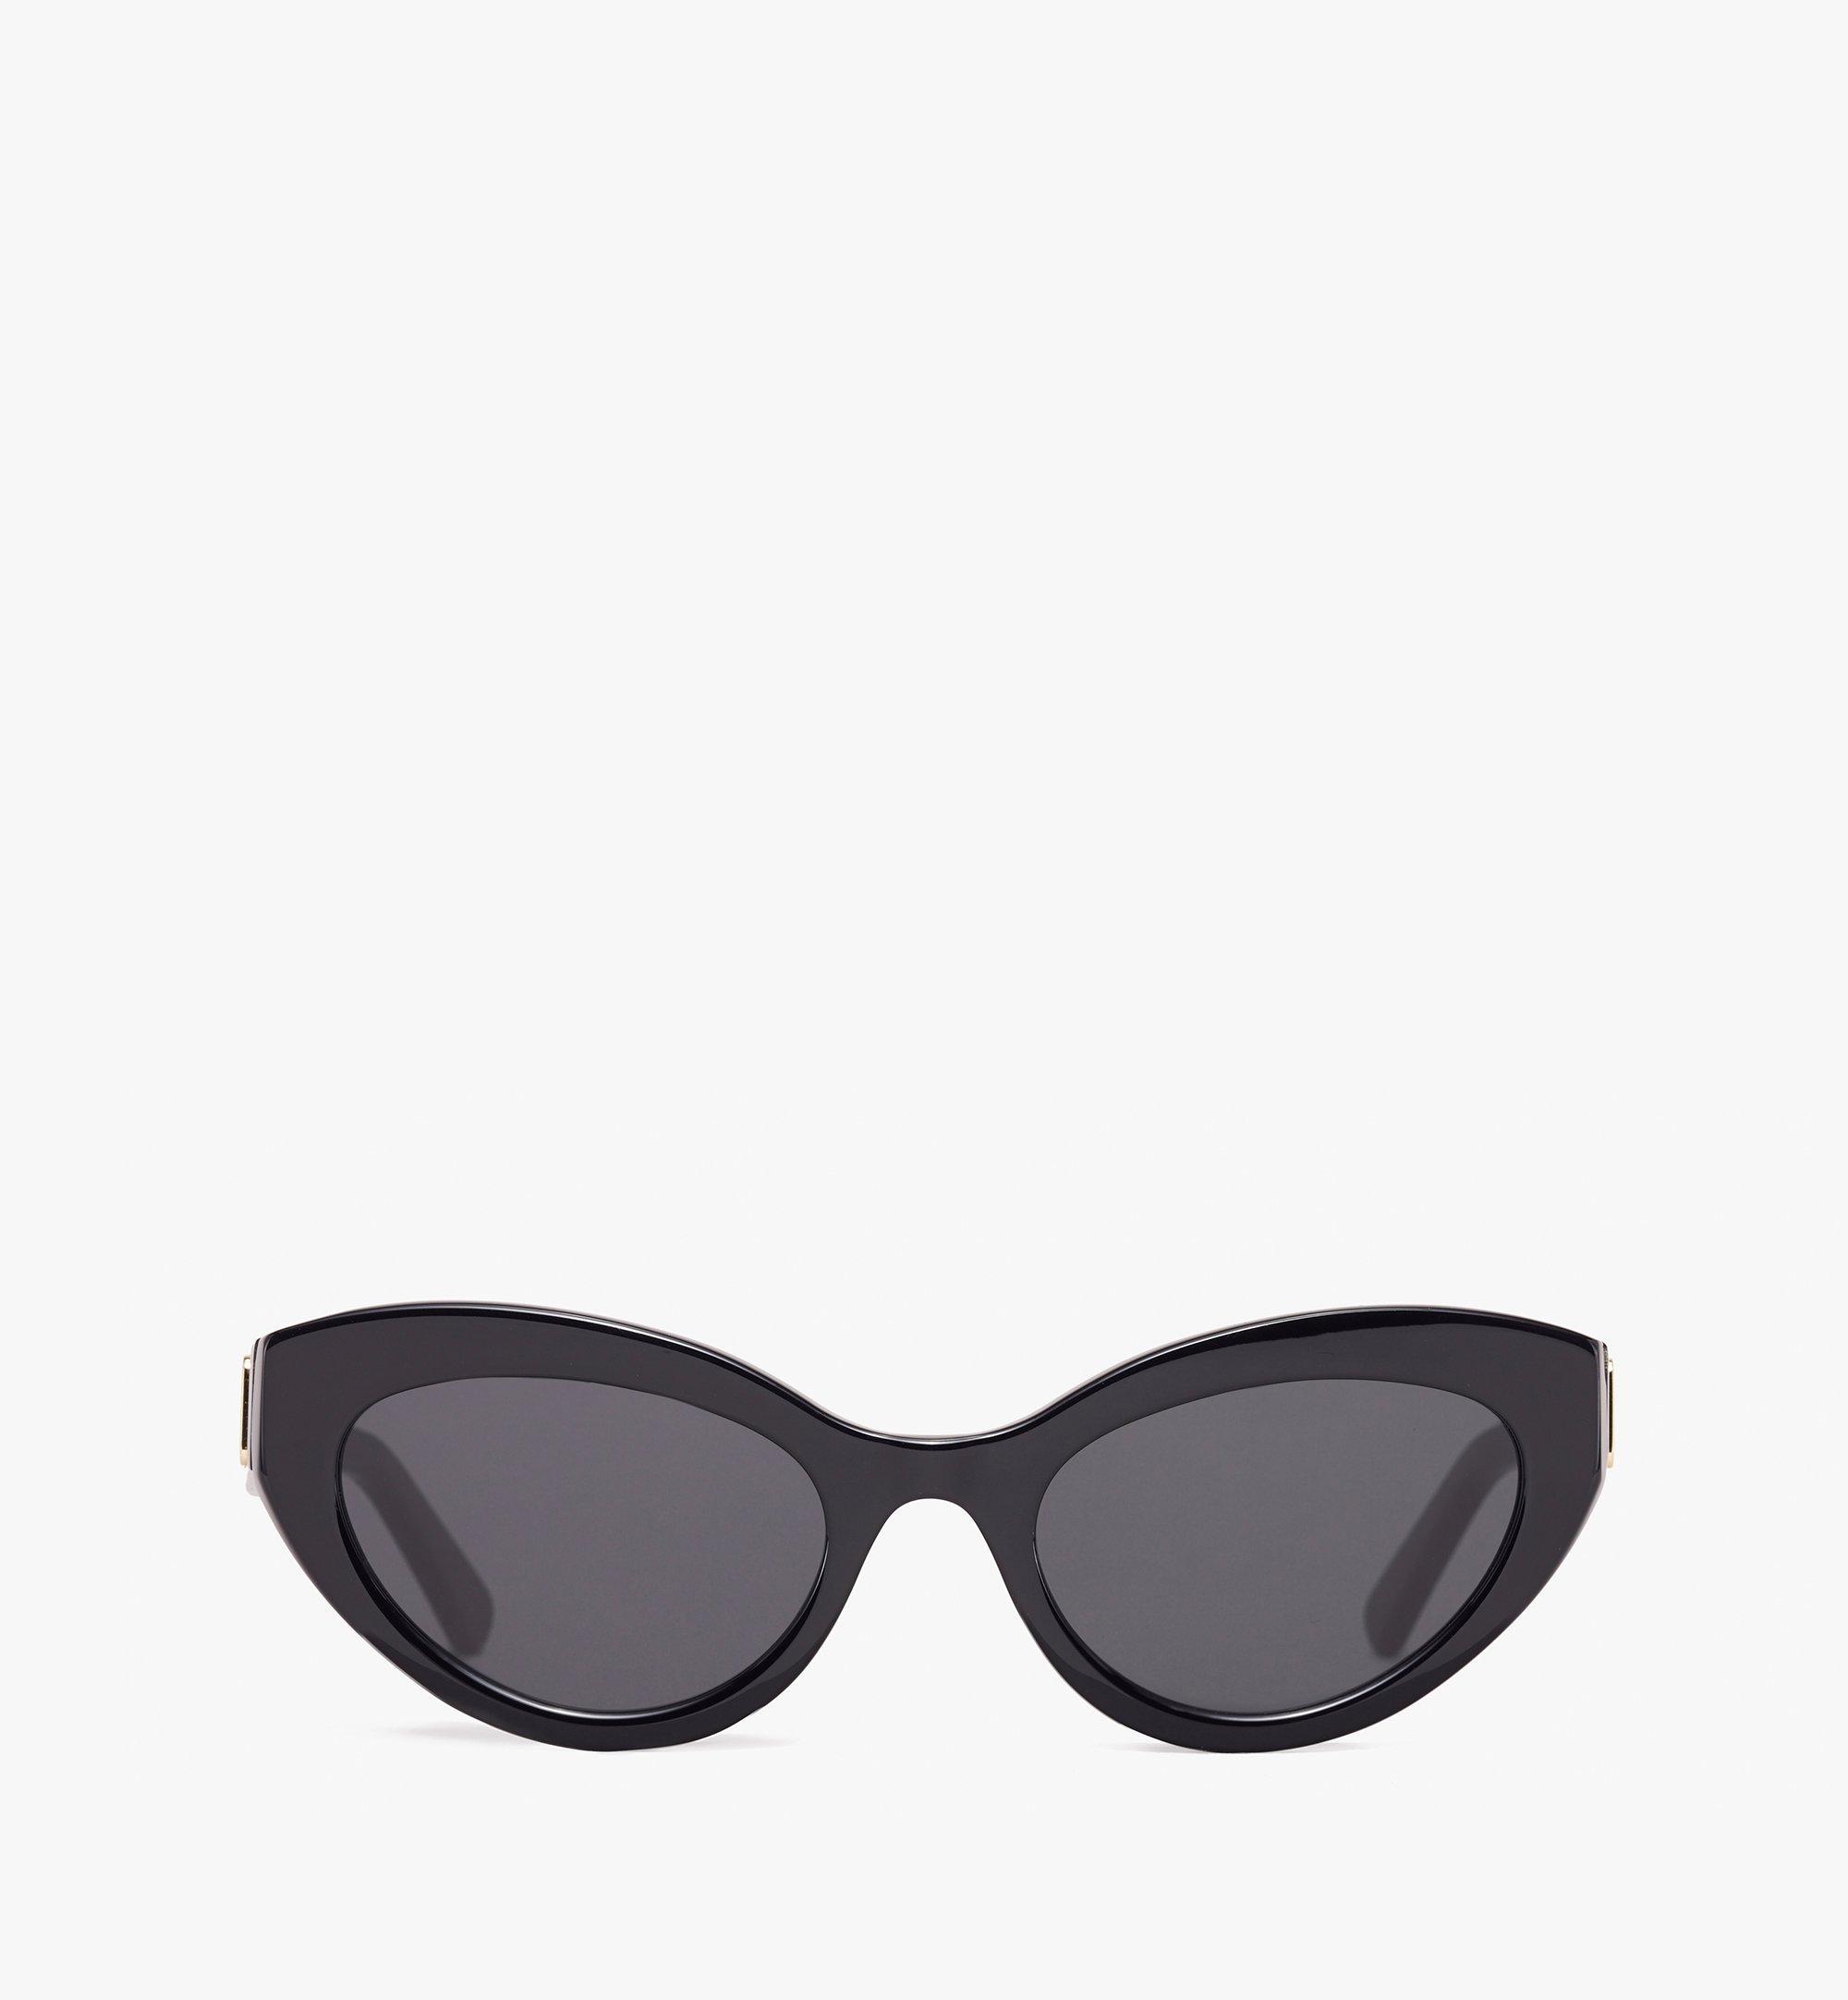 MCM Cat Eye 太陽眼鏡 Black MEG9A2I08BK001 更多視圖 1